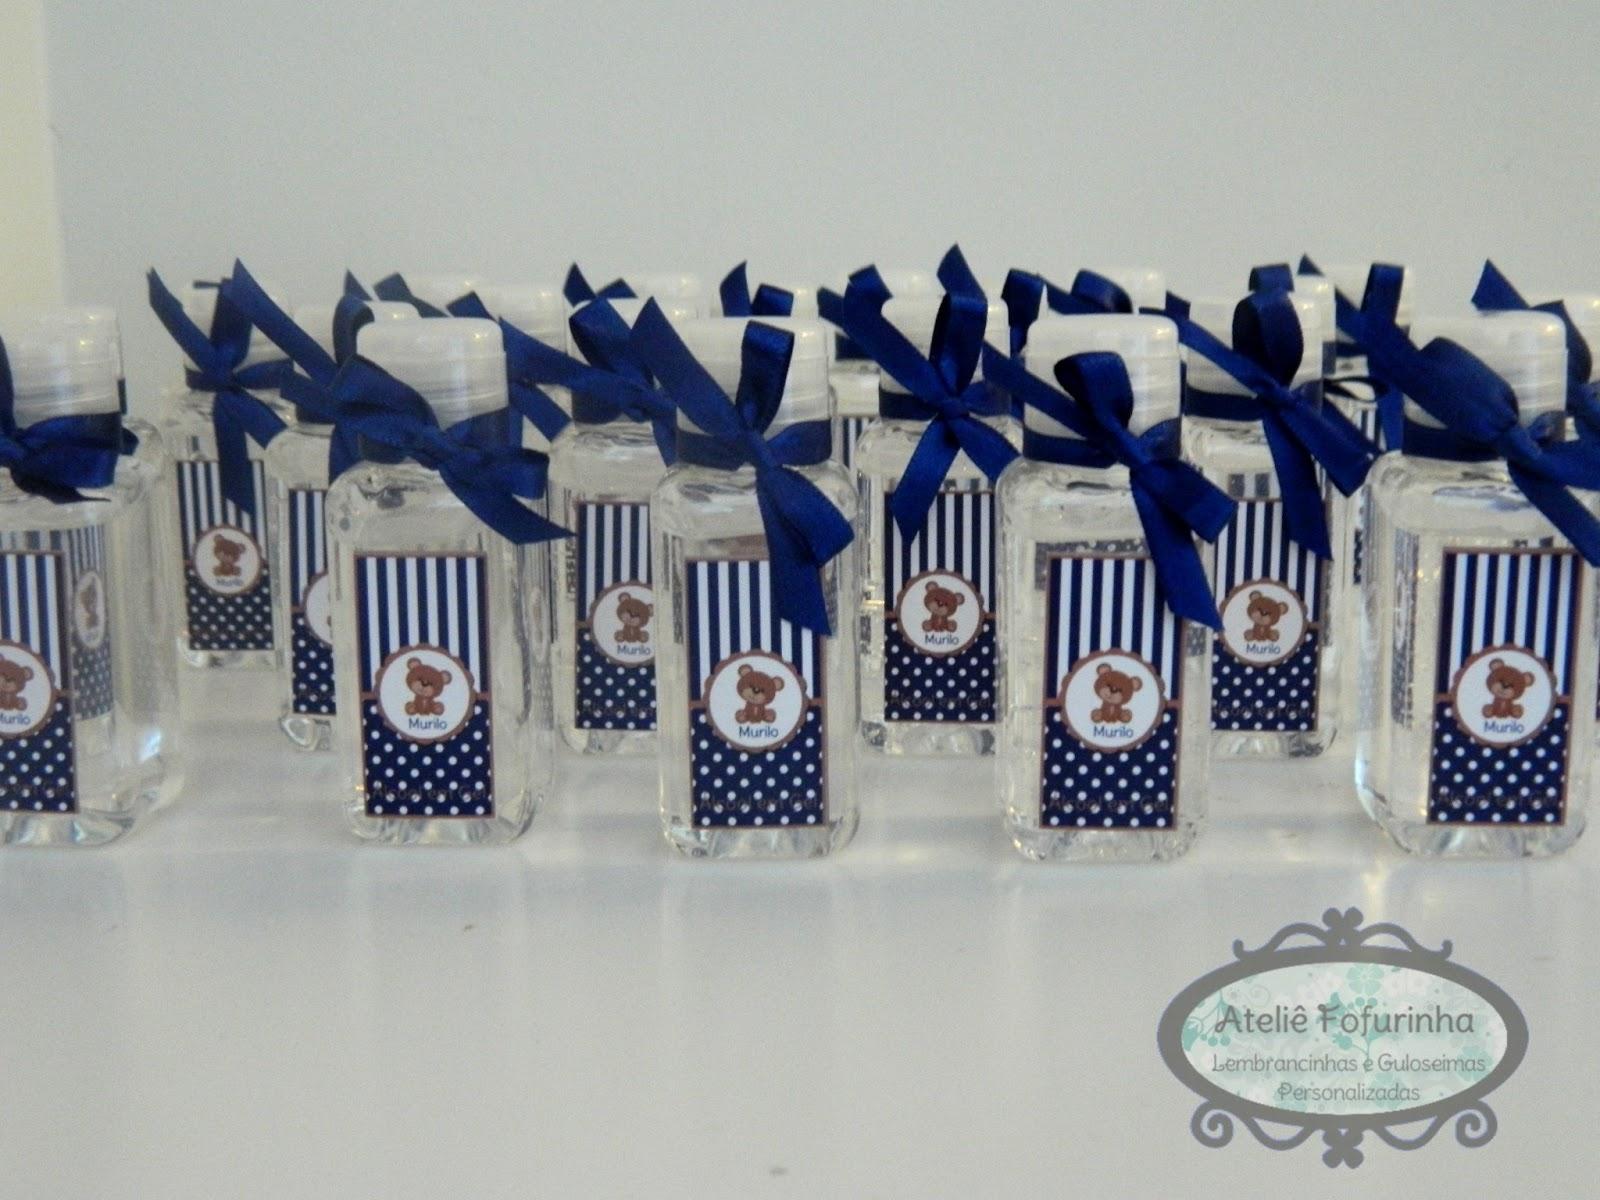 Fabuloso Ateliê Fofurinha: Lembrancinha de Maternidade - Álcool Gel com  NG43